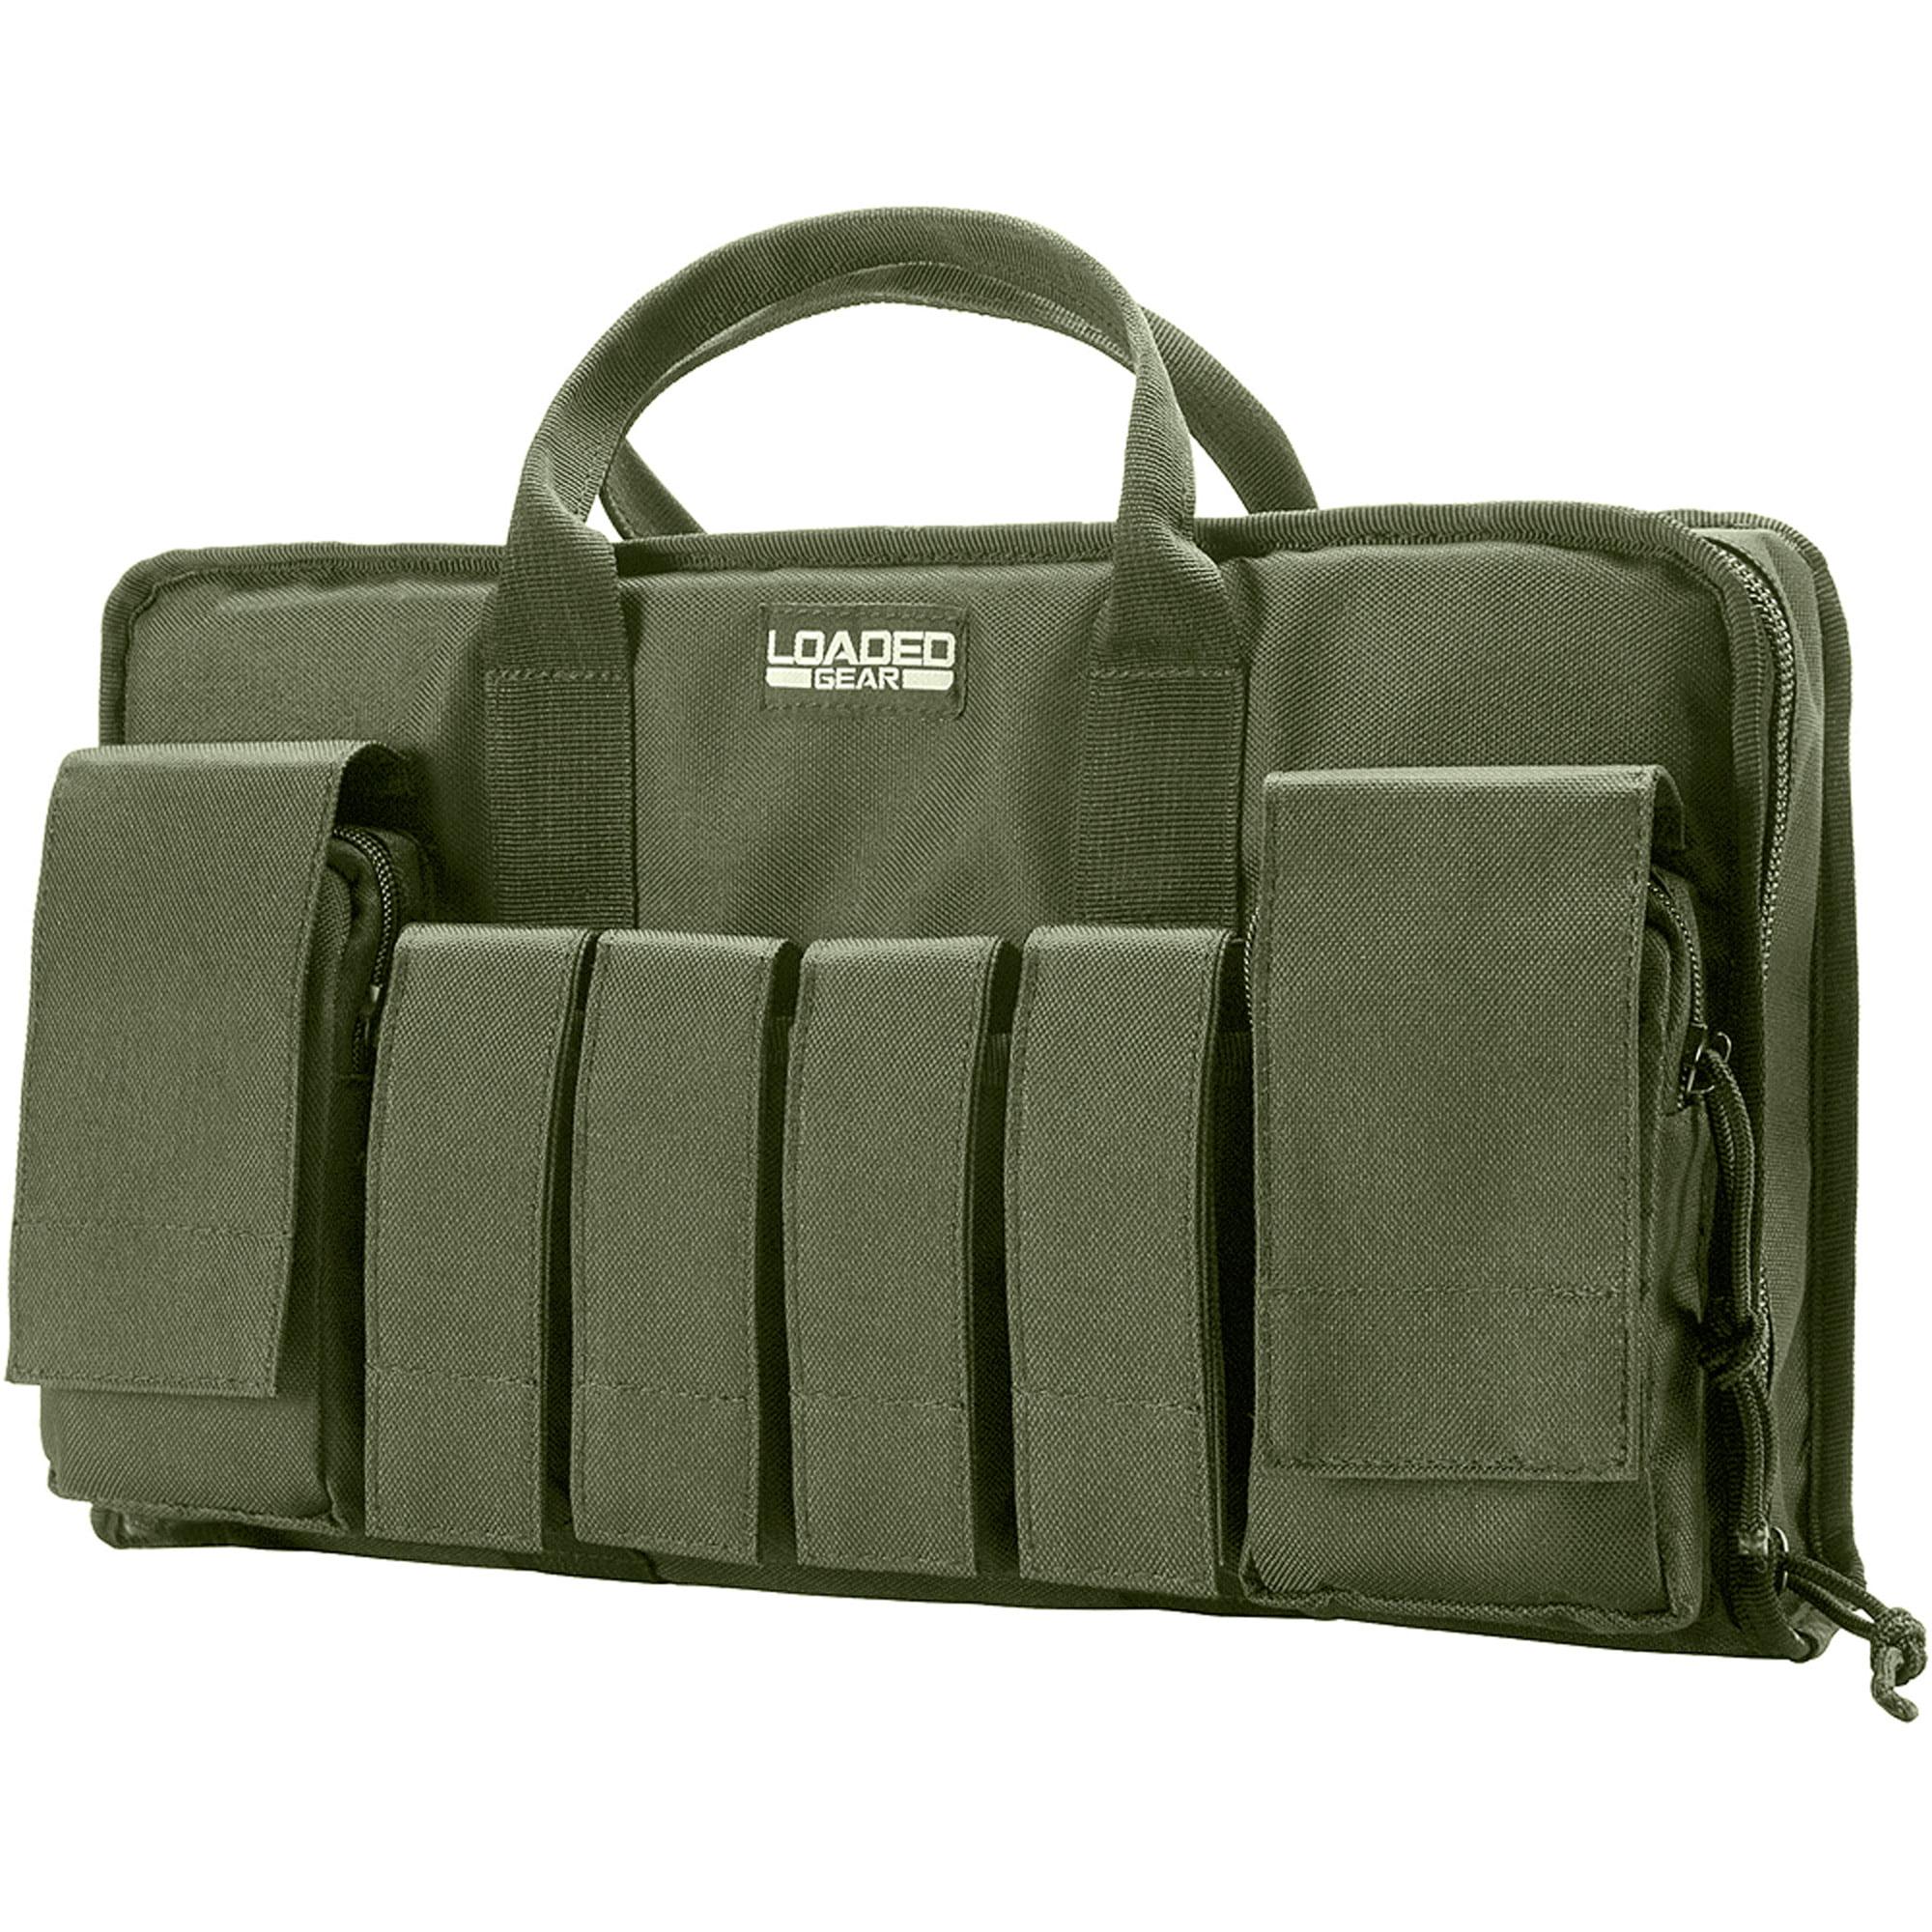 "Barska Loaded Gear RX-50 16"" Tactical Pistol Bag, Green"